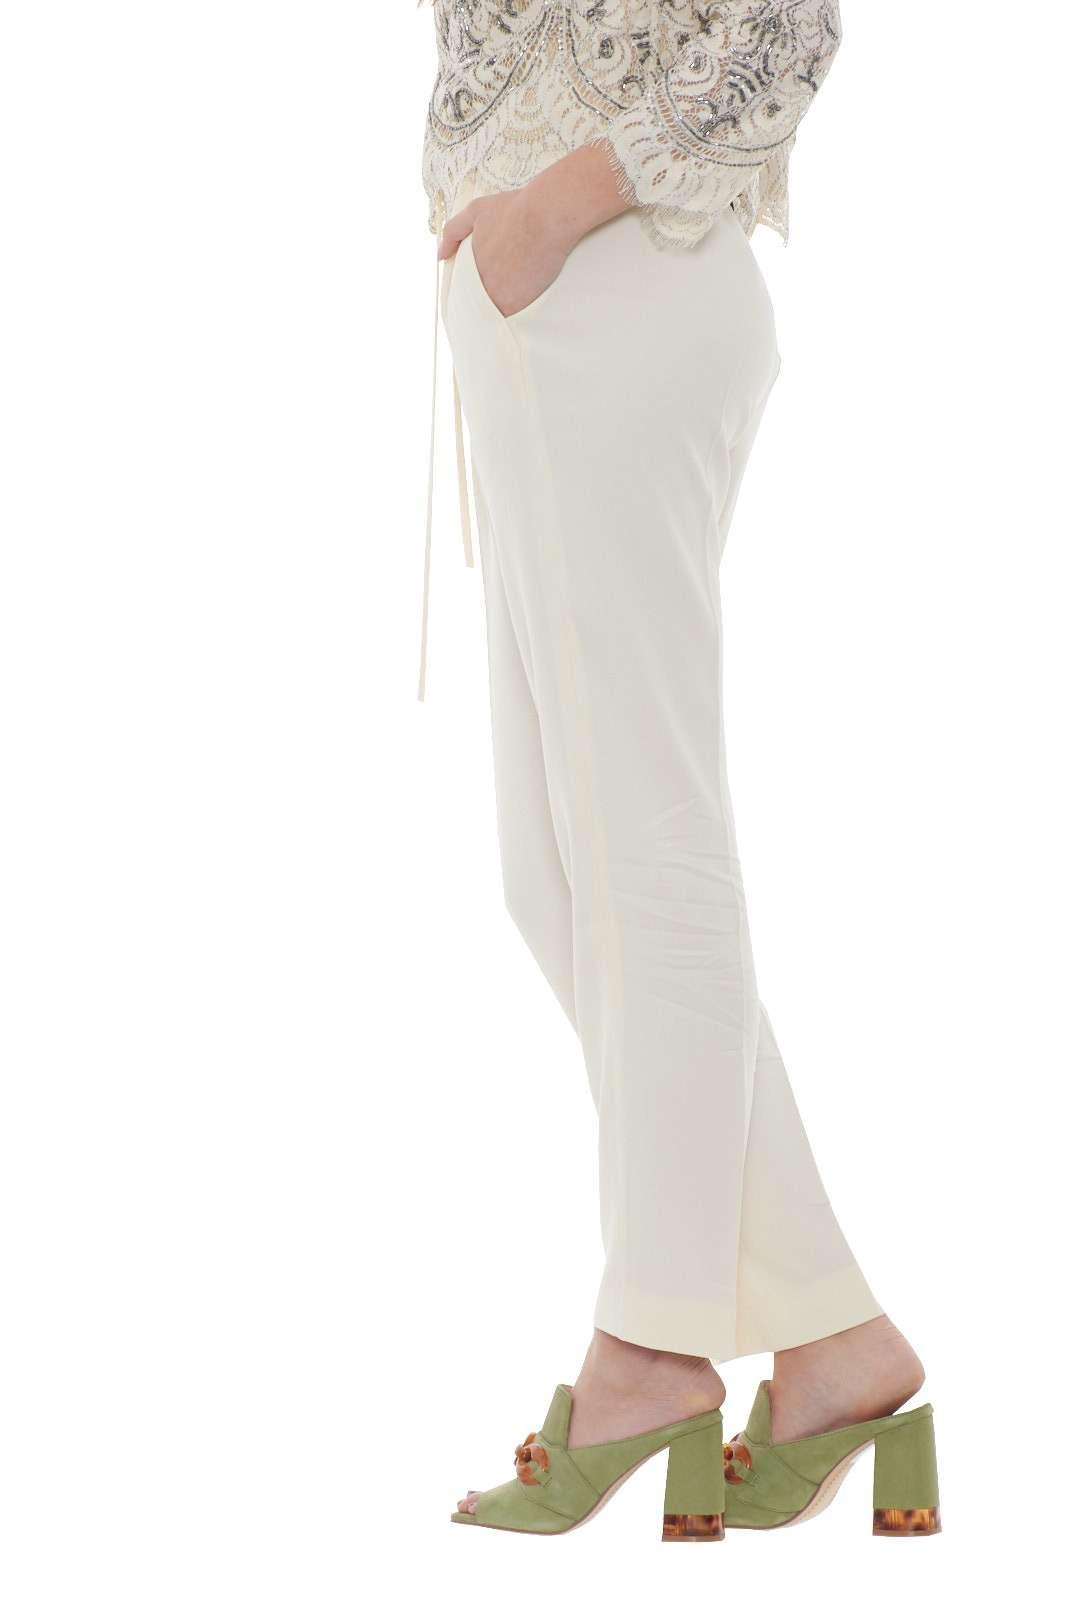 https://www.parmax.com/media/catalog/product/a/i/PE-outlet_parmax-pantaloni-donna-TwinSet-201TP2431-B.jpg